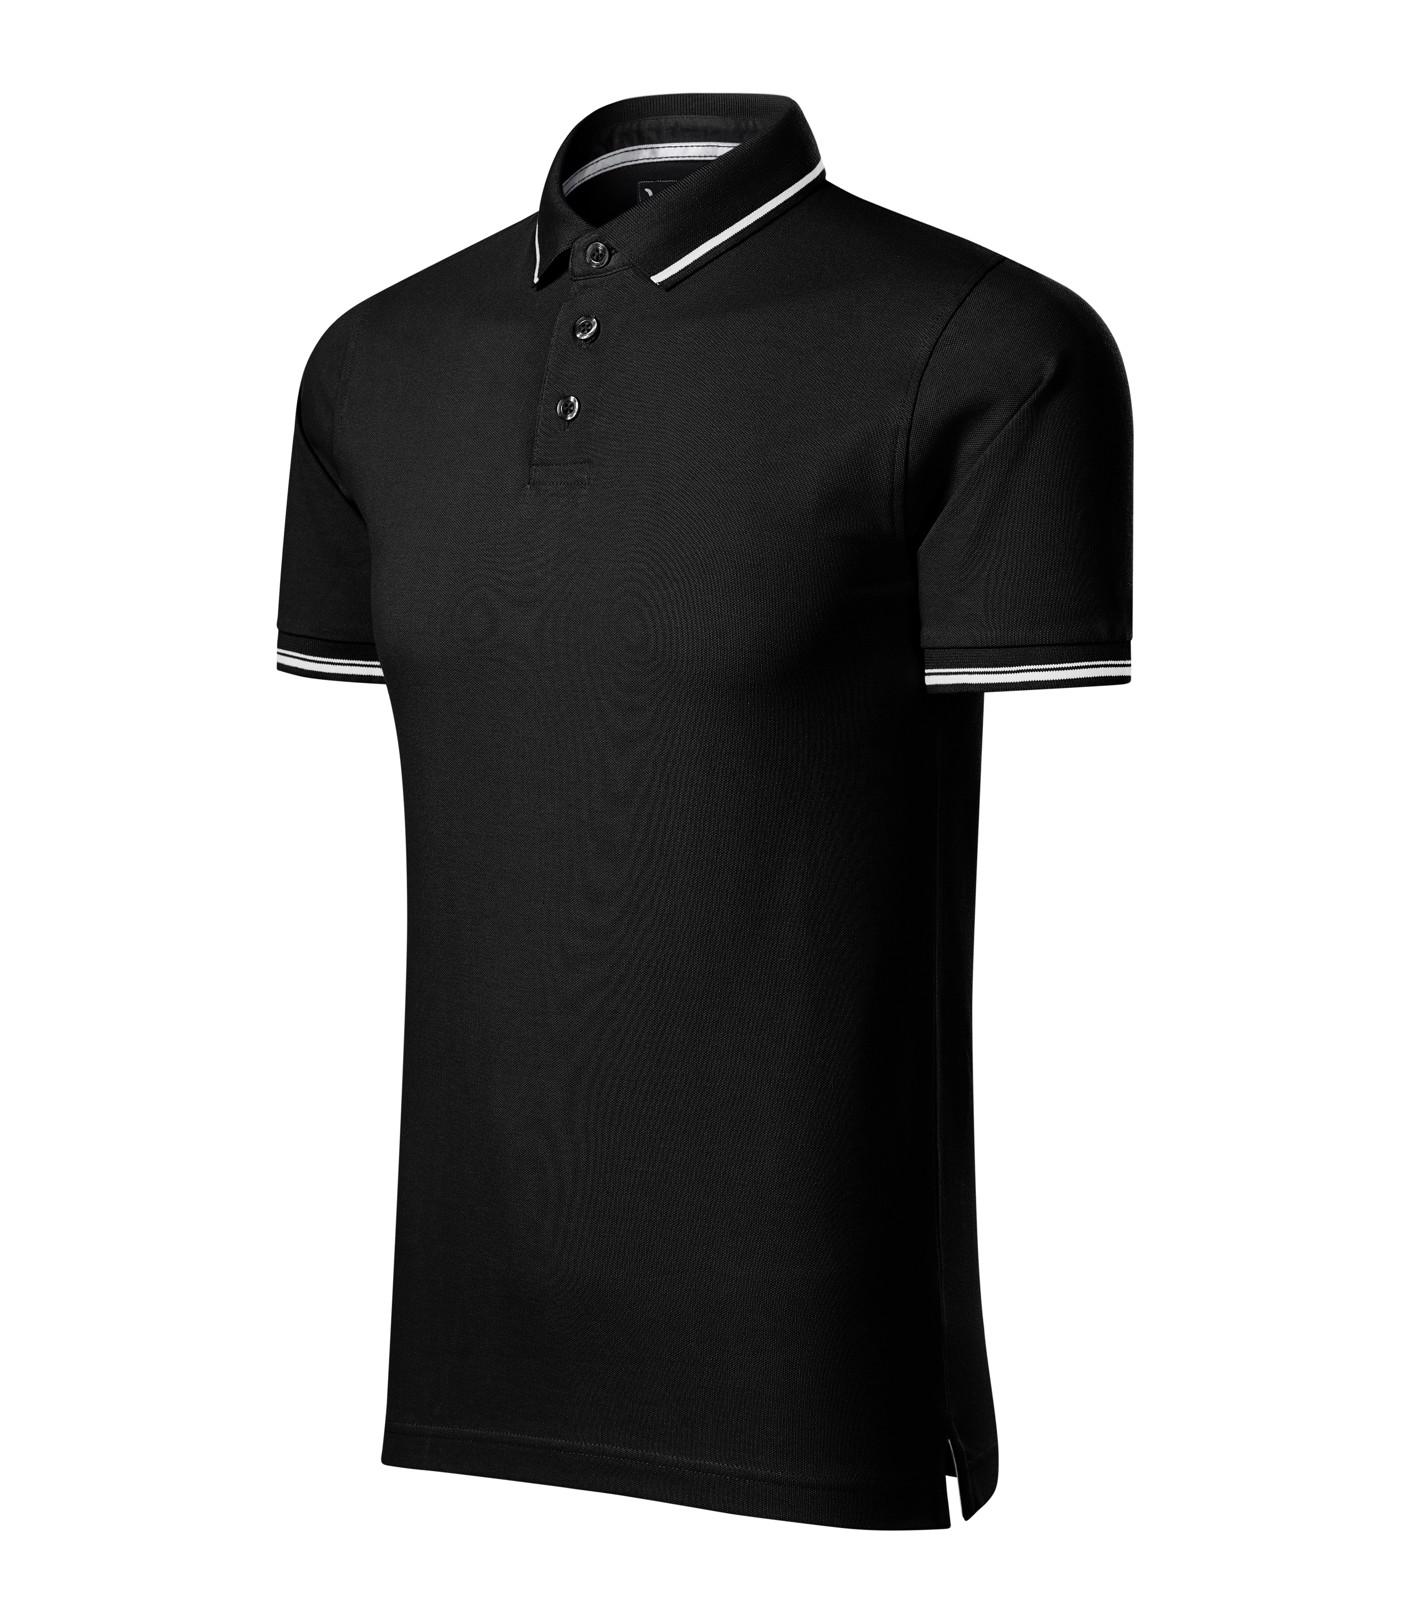 Polo Shirt men's Malfinipremium Perfection plain - Black / M